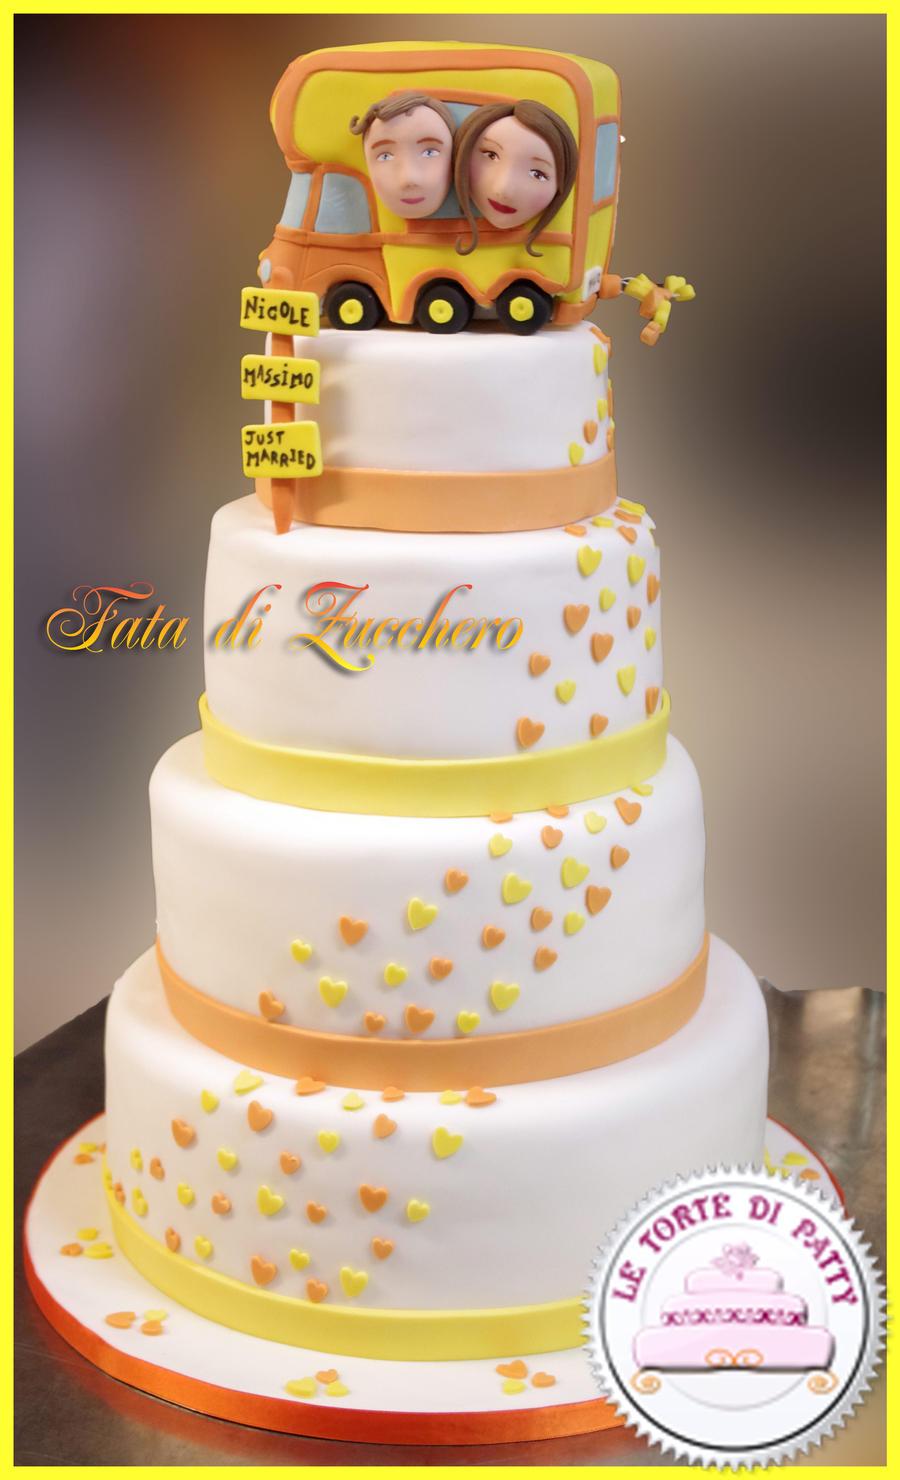 Funny Wedding Cake By Dyda81 On Deviantart